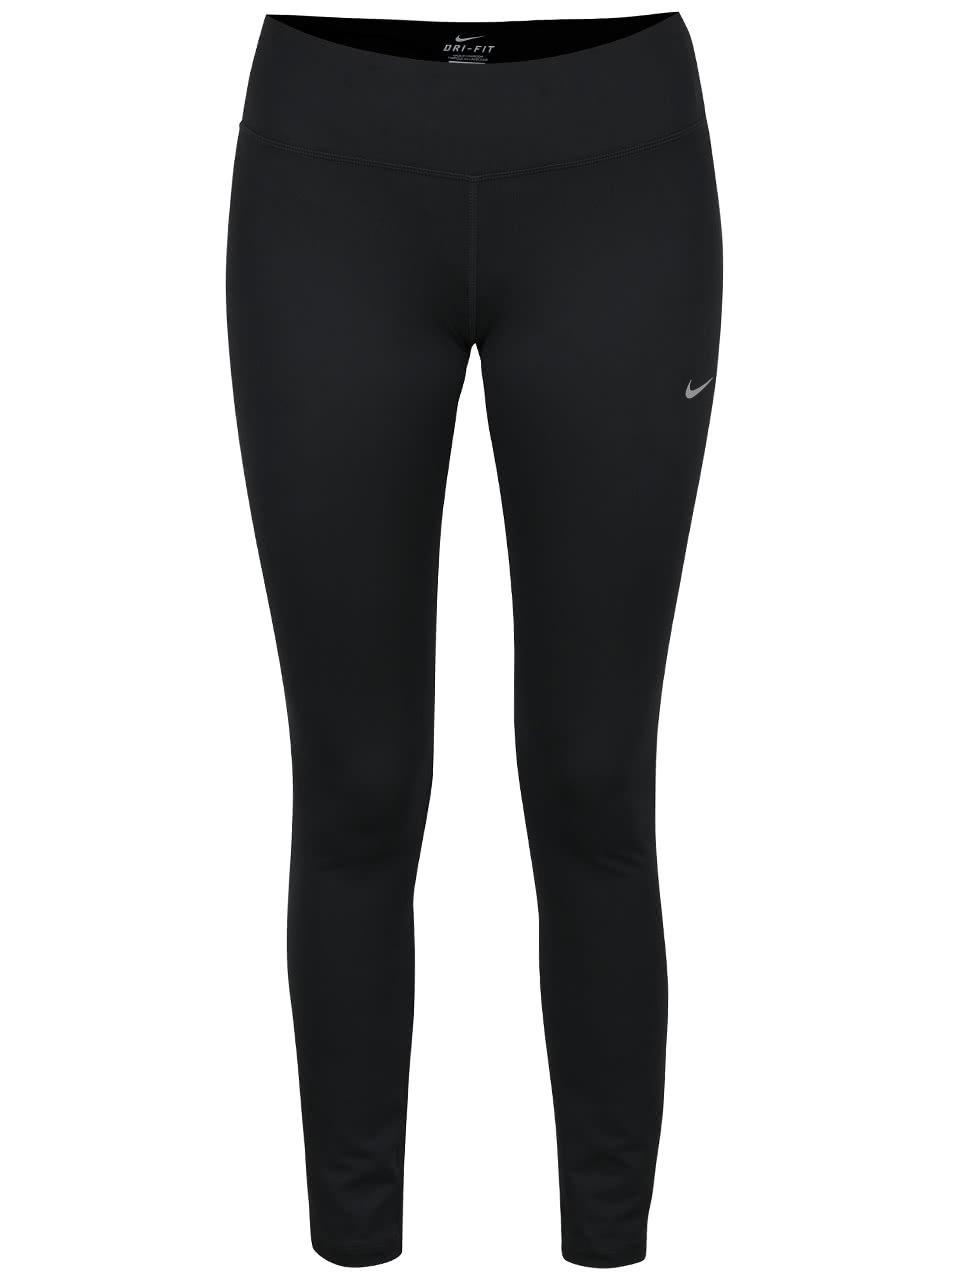 19d30dcfc476 Čierne dámske legíny Nike DF Epic Run ...